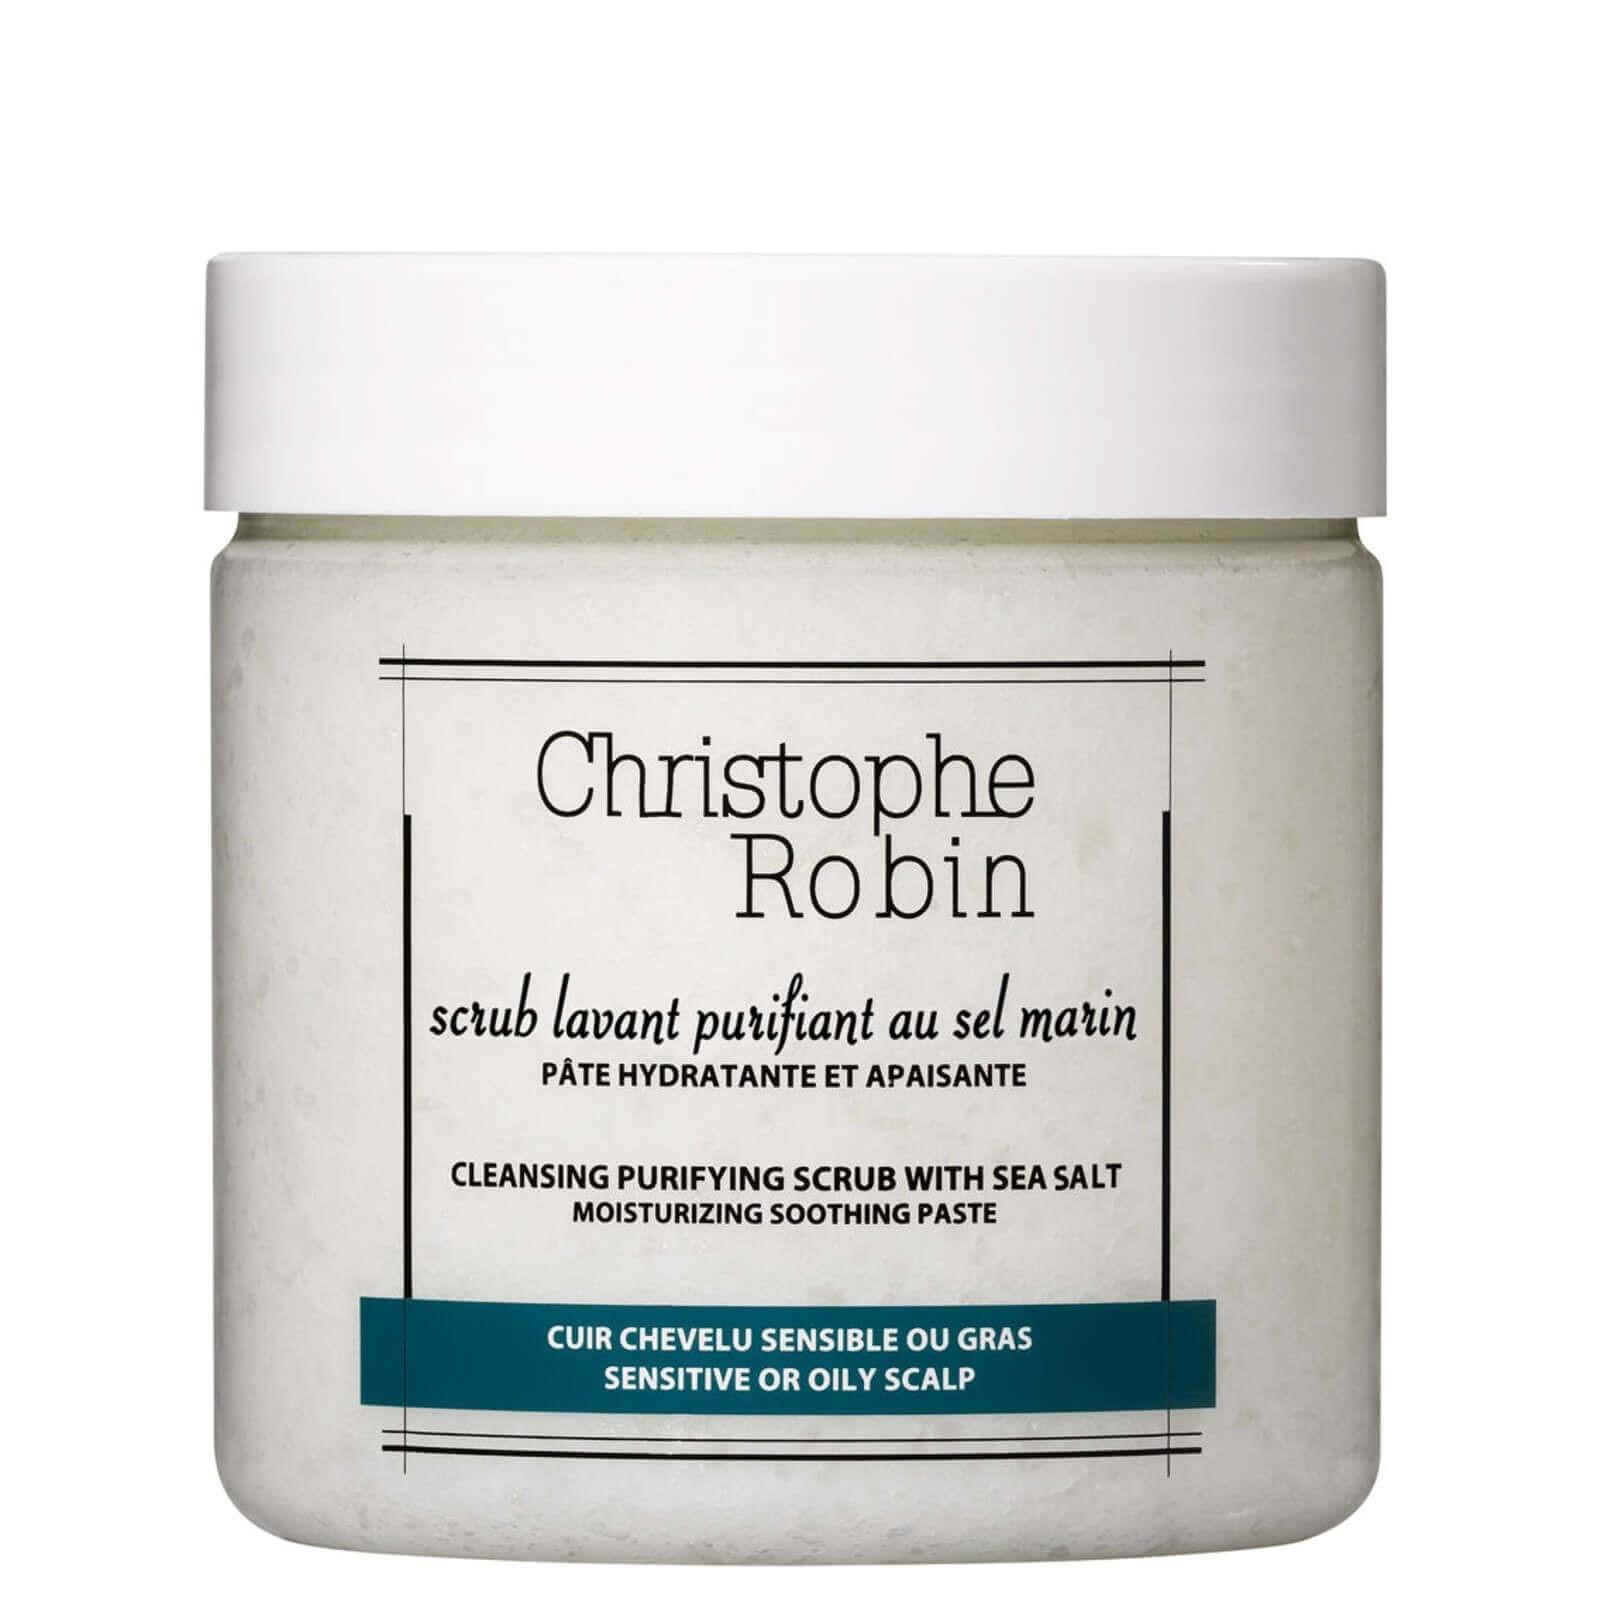 Christophe Robin 海盐清洁洗发膏